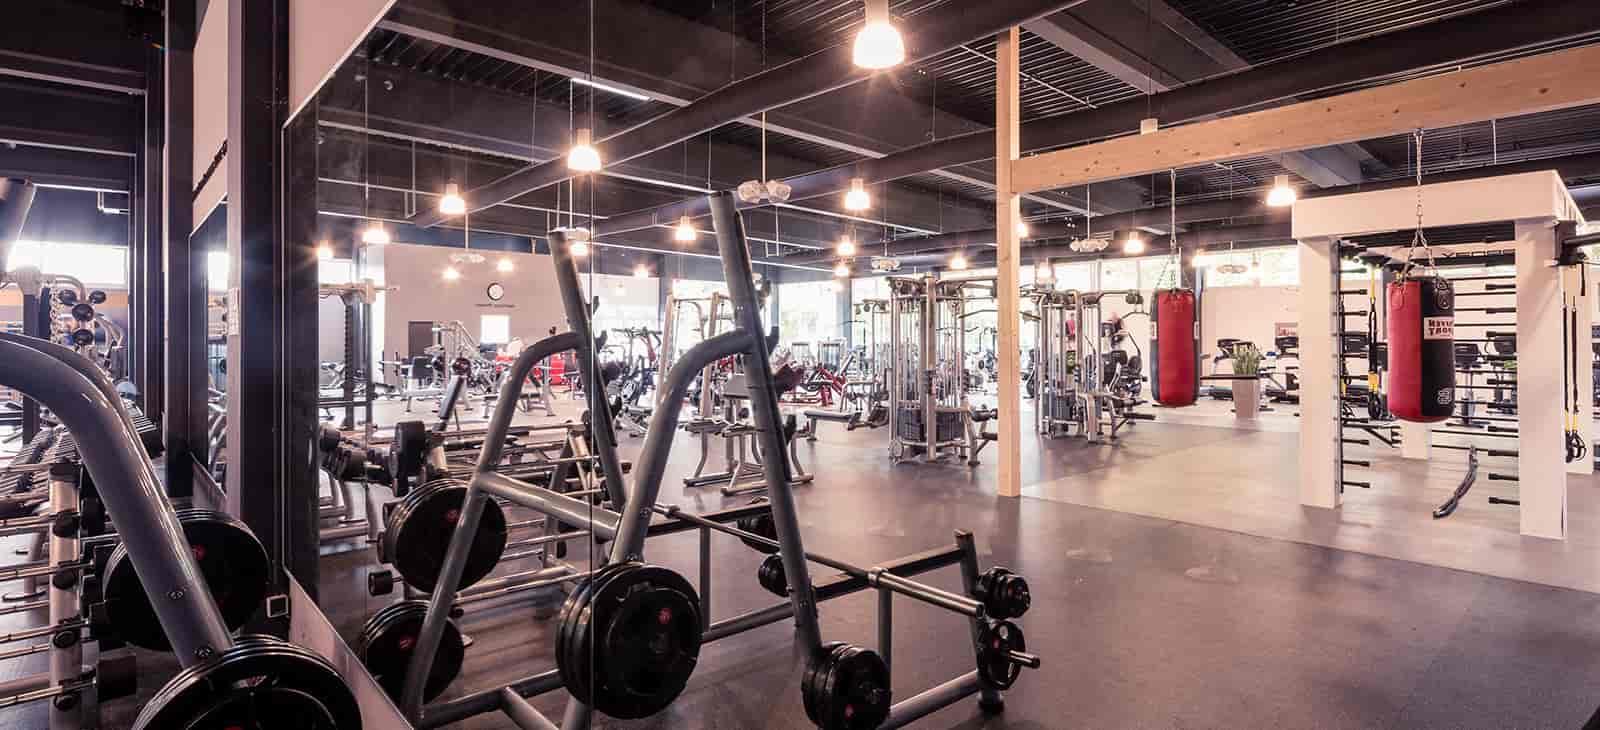 Fitnessstudio kraftwerk gundelfingen functional trainingsbereich